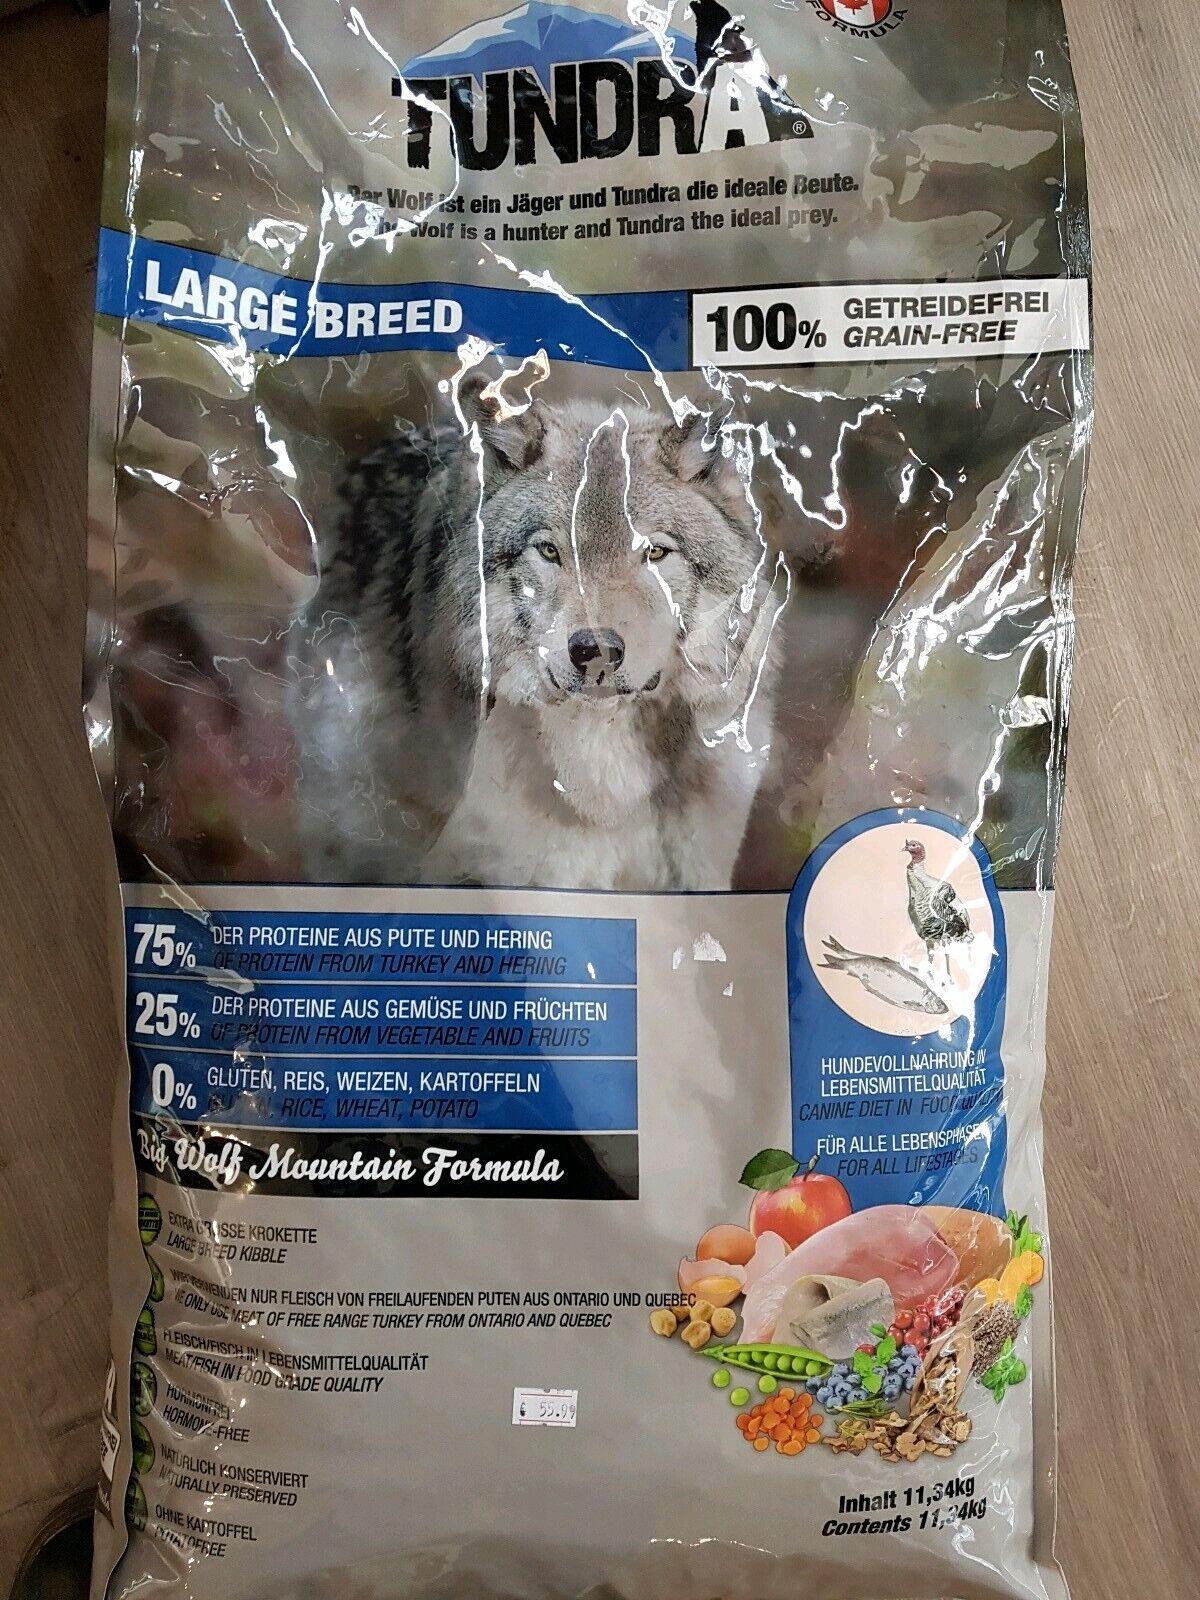 11,34 kg Tundra Large Breed1kg=